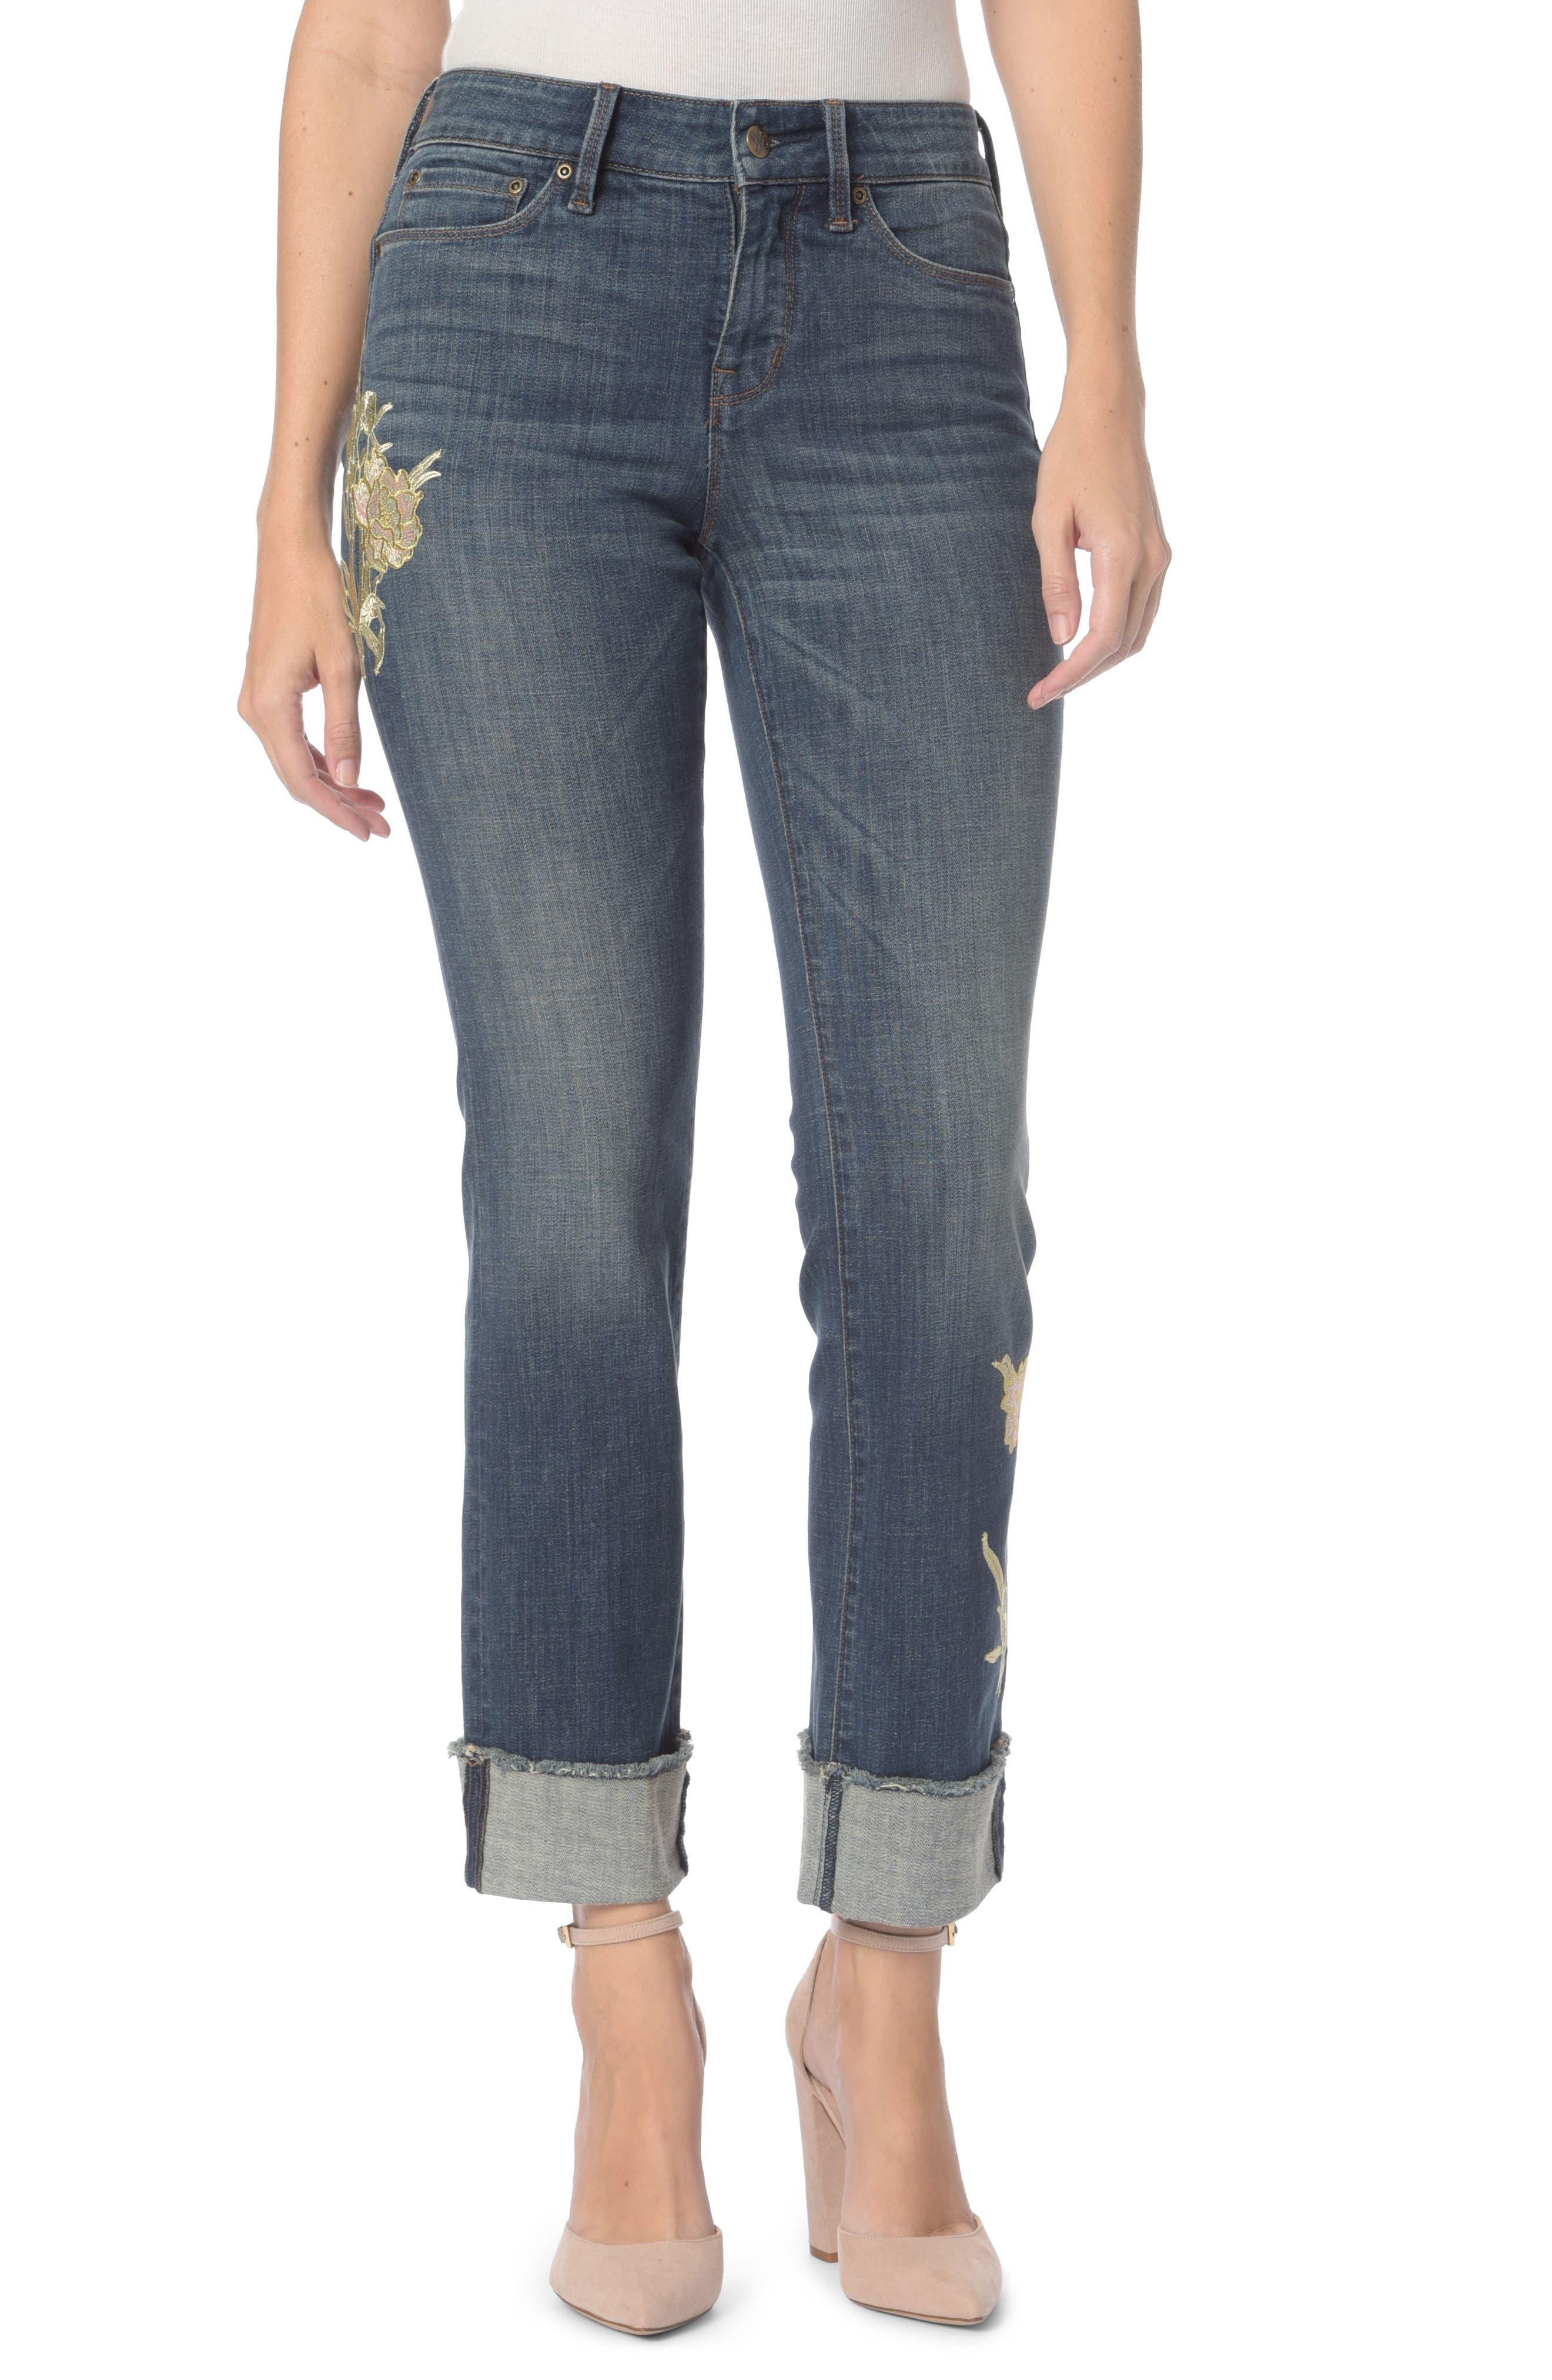 Marilyn Appliqué Stretch Straight Leg Ankle Jeans,                         Main,                         color, 420